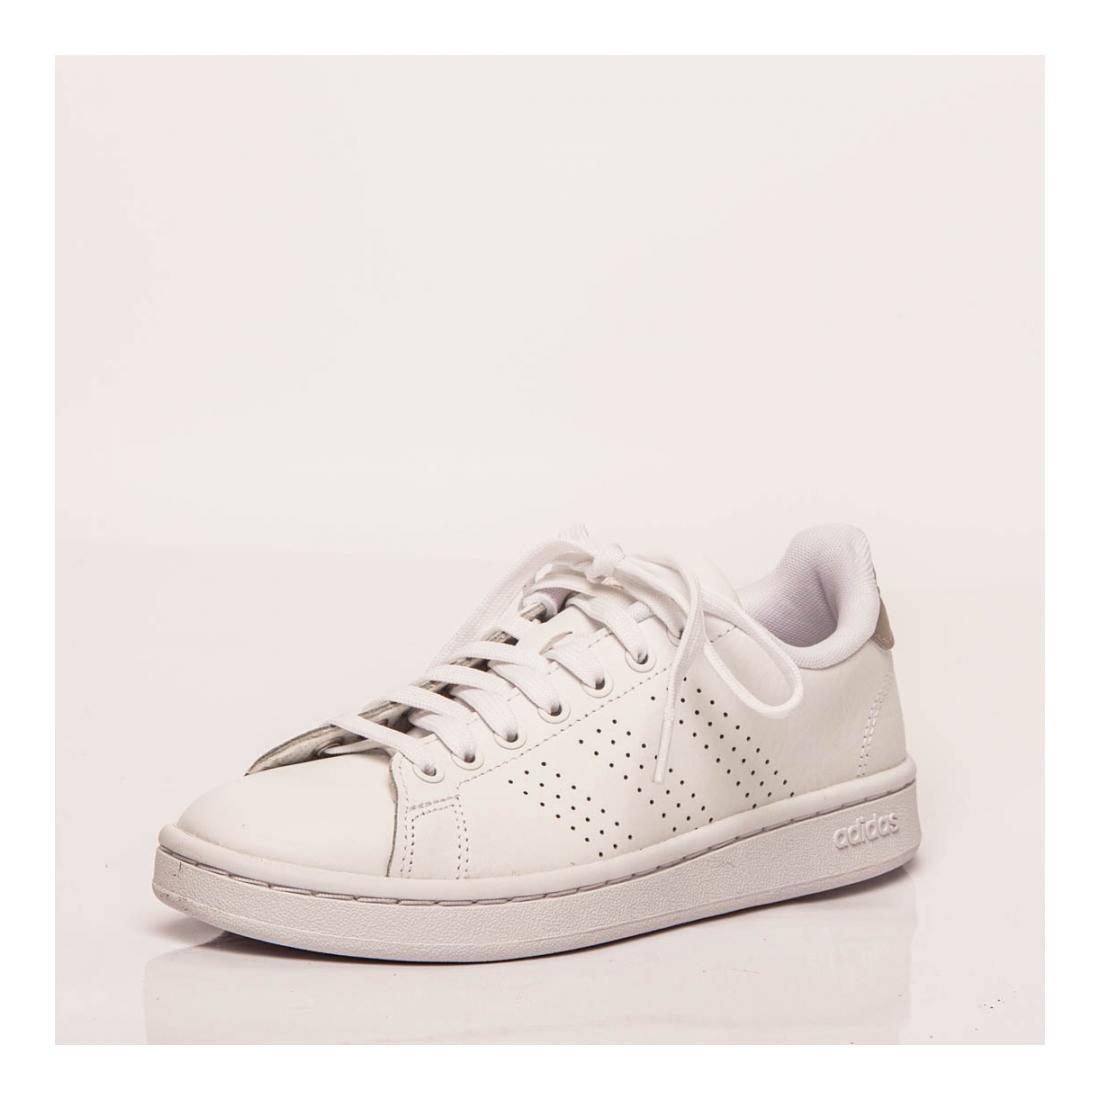 adidas Sneaker F36223-000 Advantage